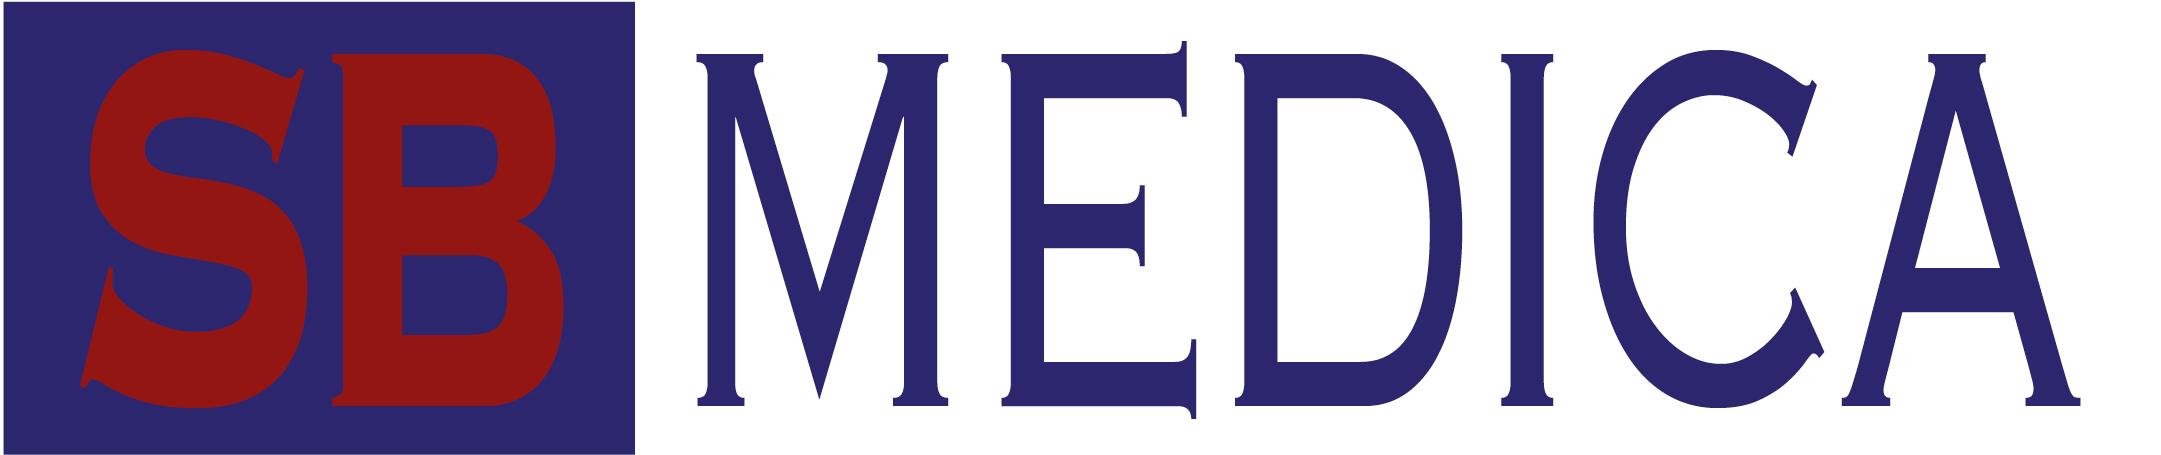 http://www.sbmedica.com/wp-content/uploads/2013/08/Logo-SB-Medica.jpg